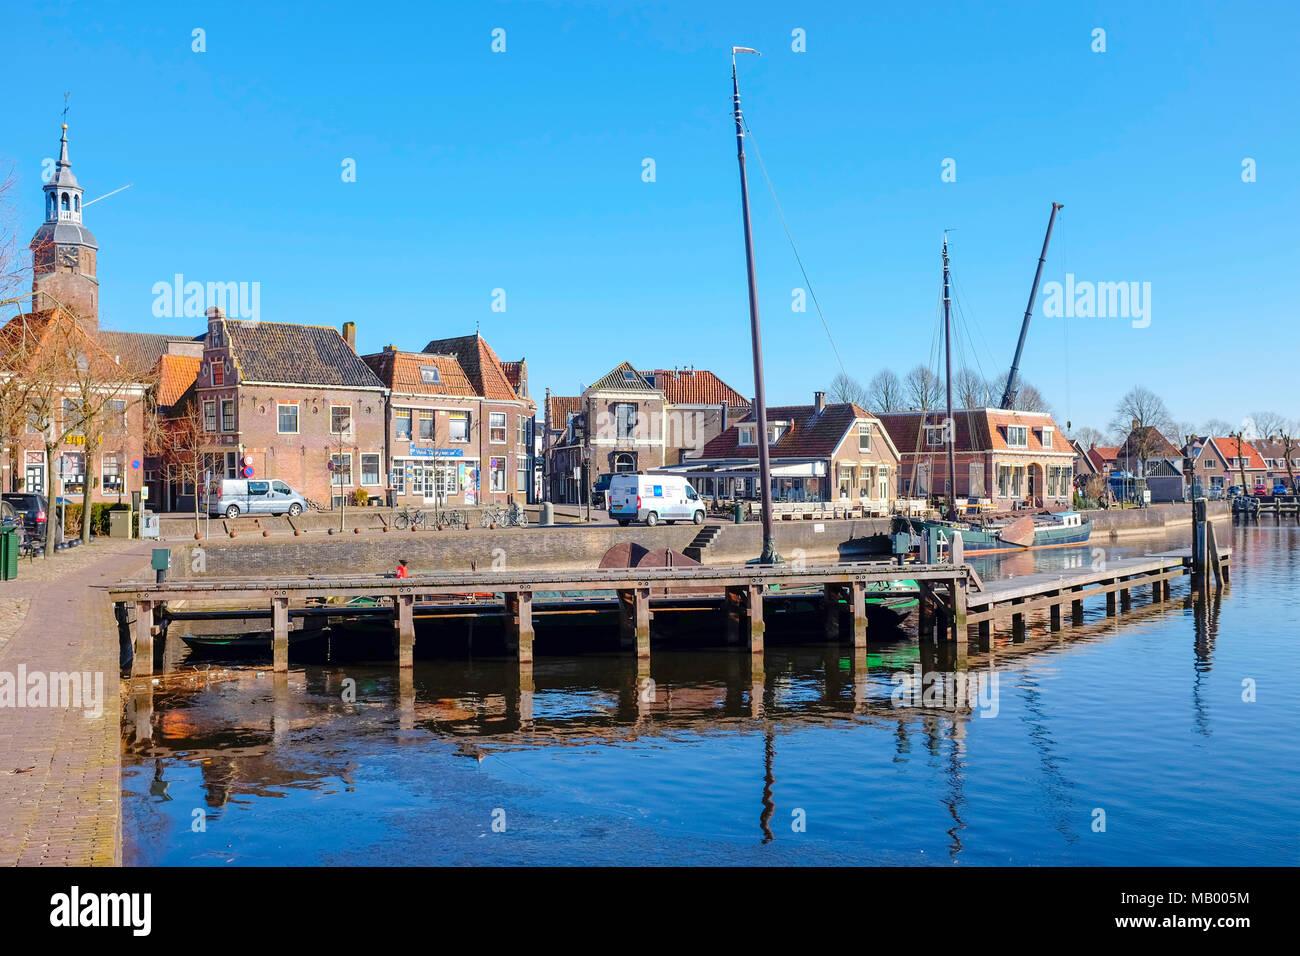 Historic Architecture in Blokzijl, Overijssel, The Netherlands. Stock Photo